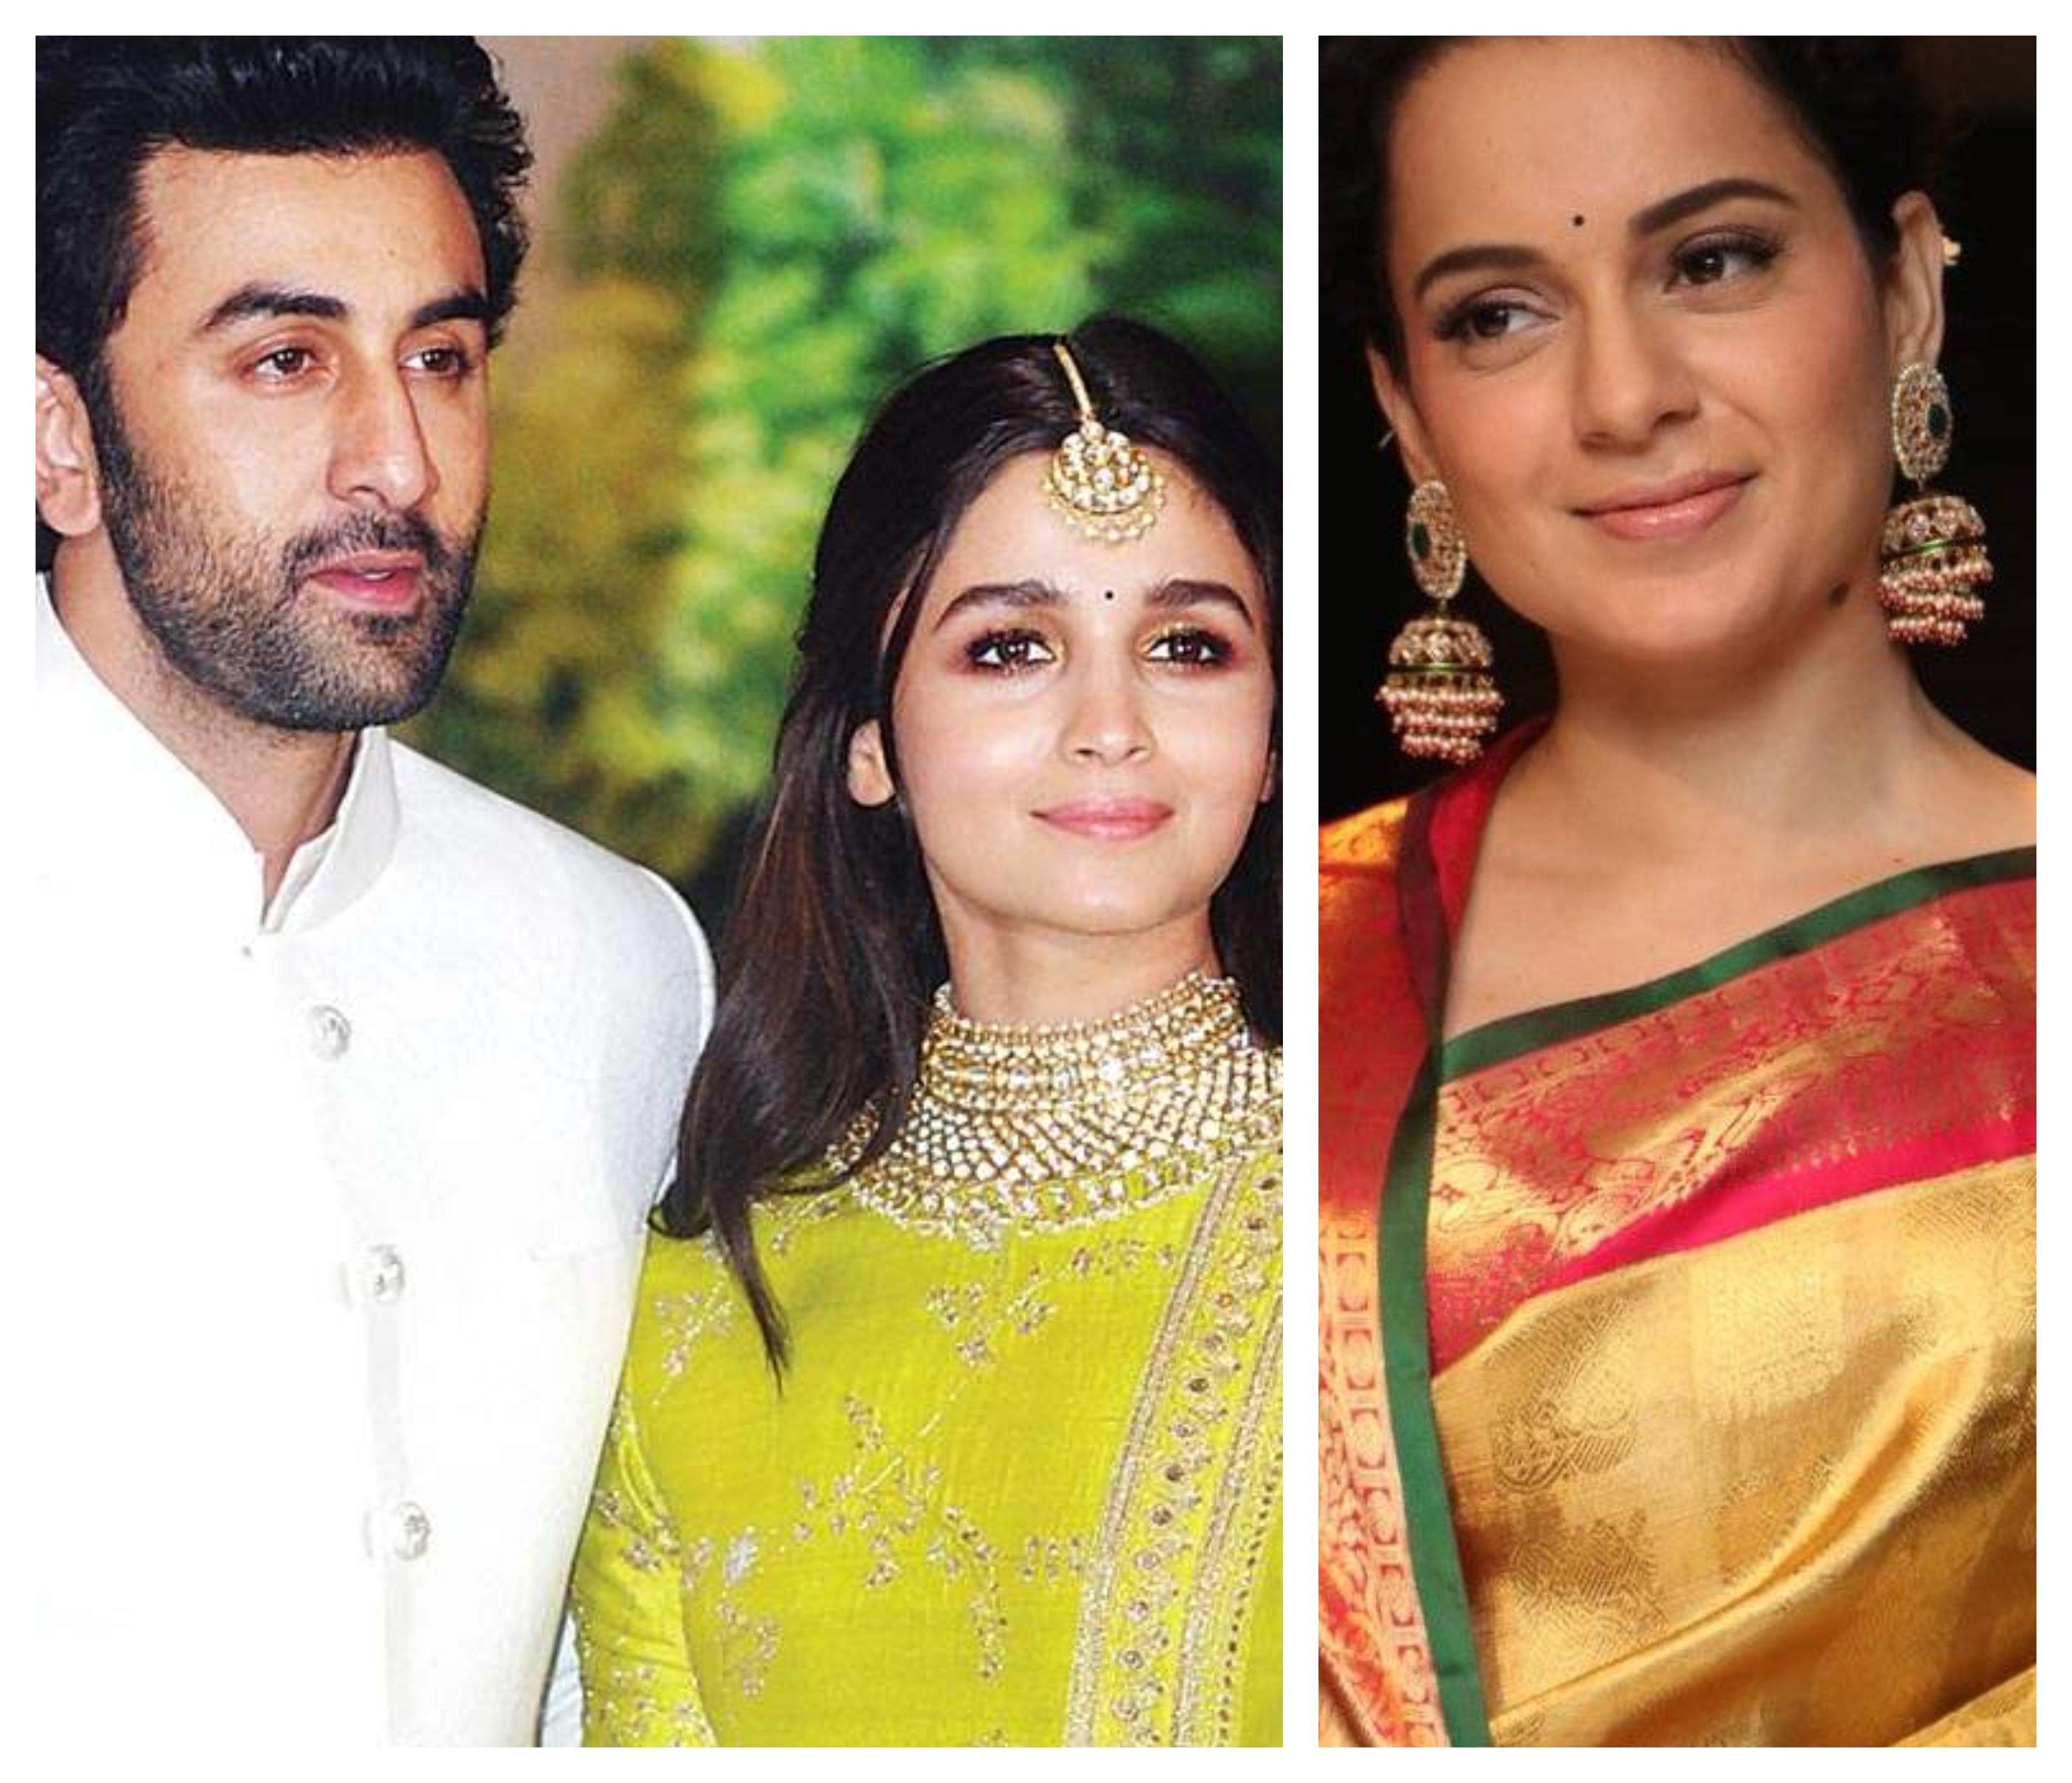 Kangana Ranaut Slams Ranbir Kapoor and Alia Bhatt Again. Social Media Reacts